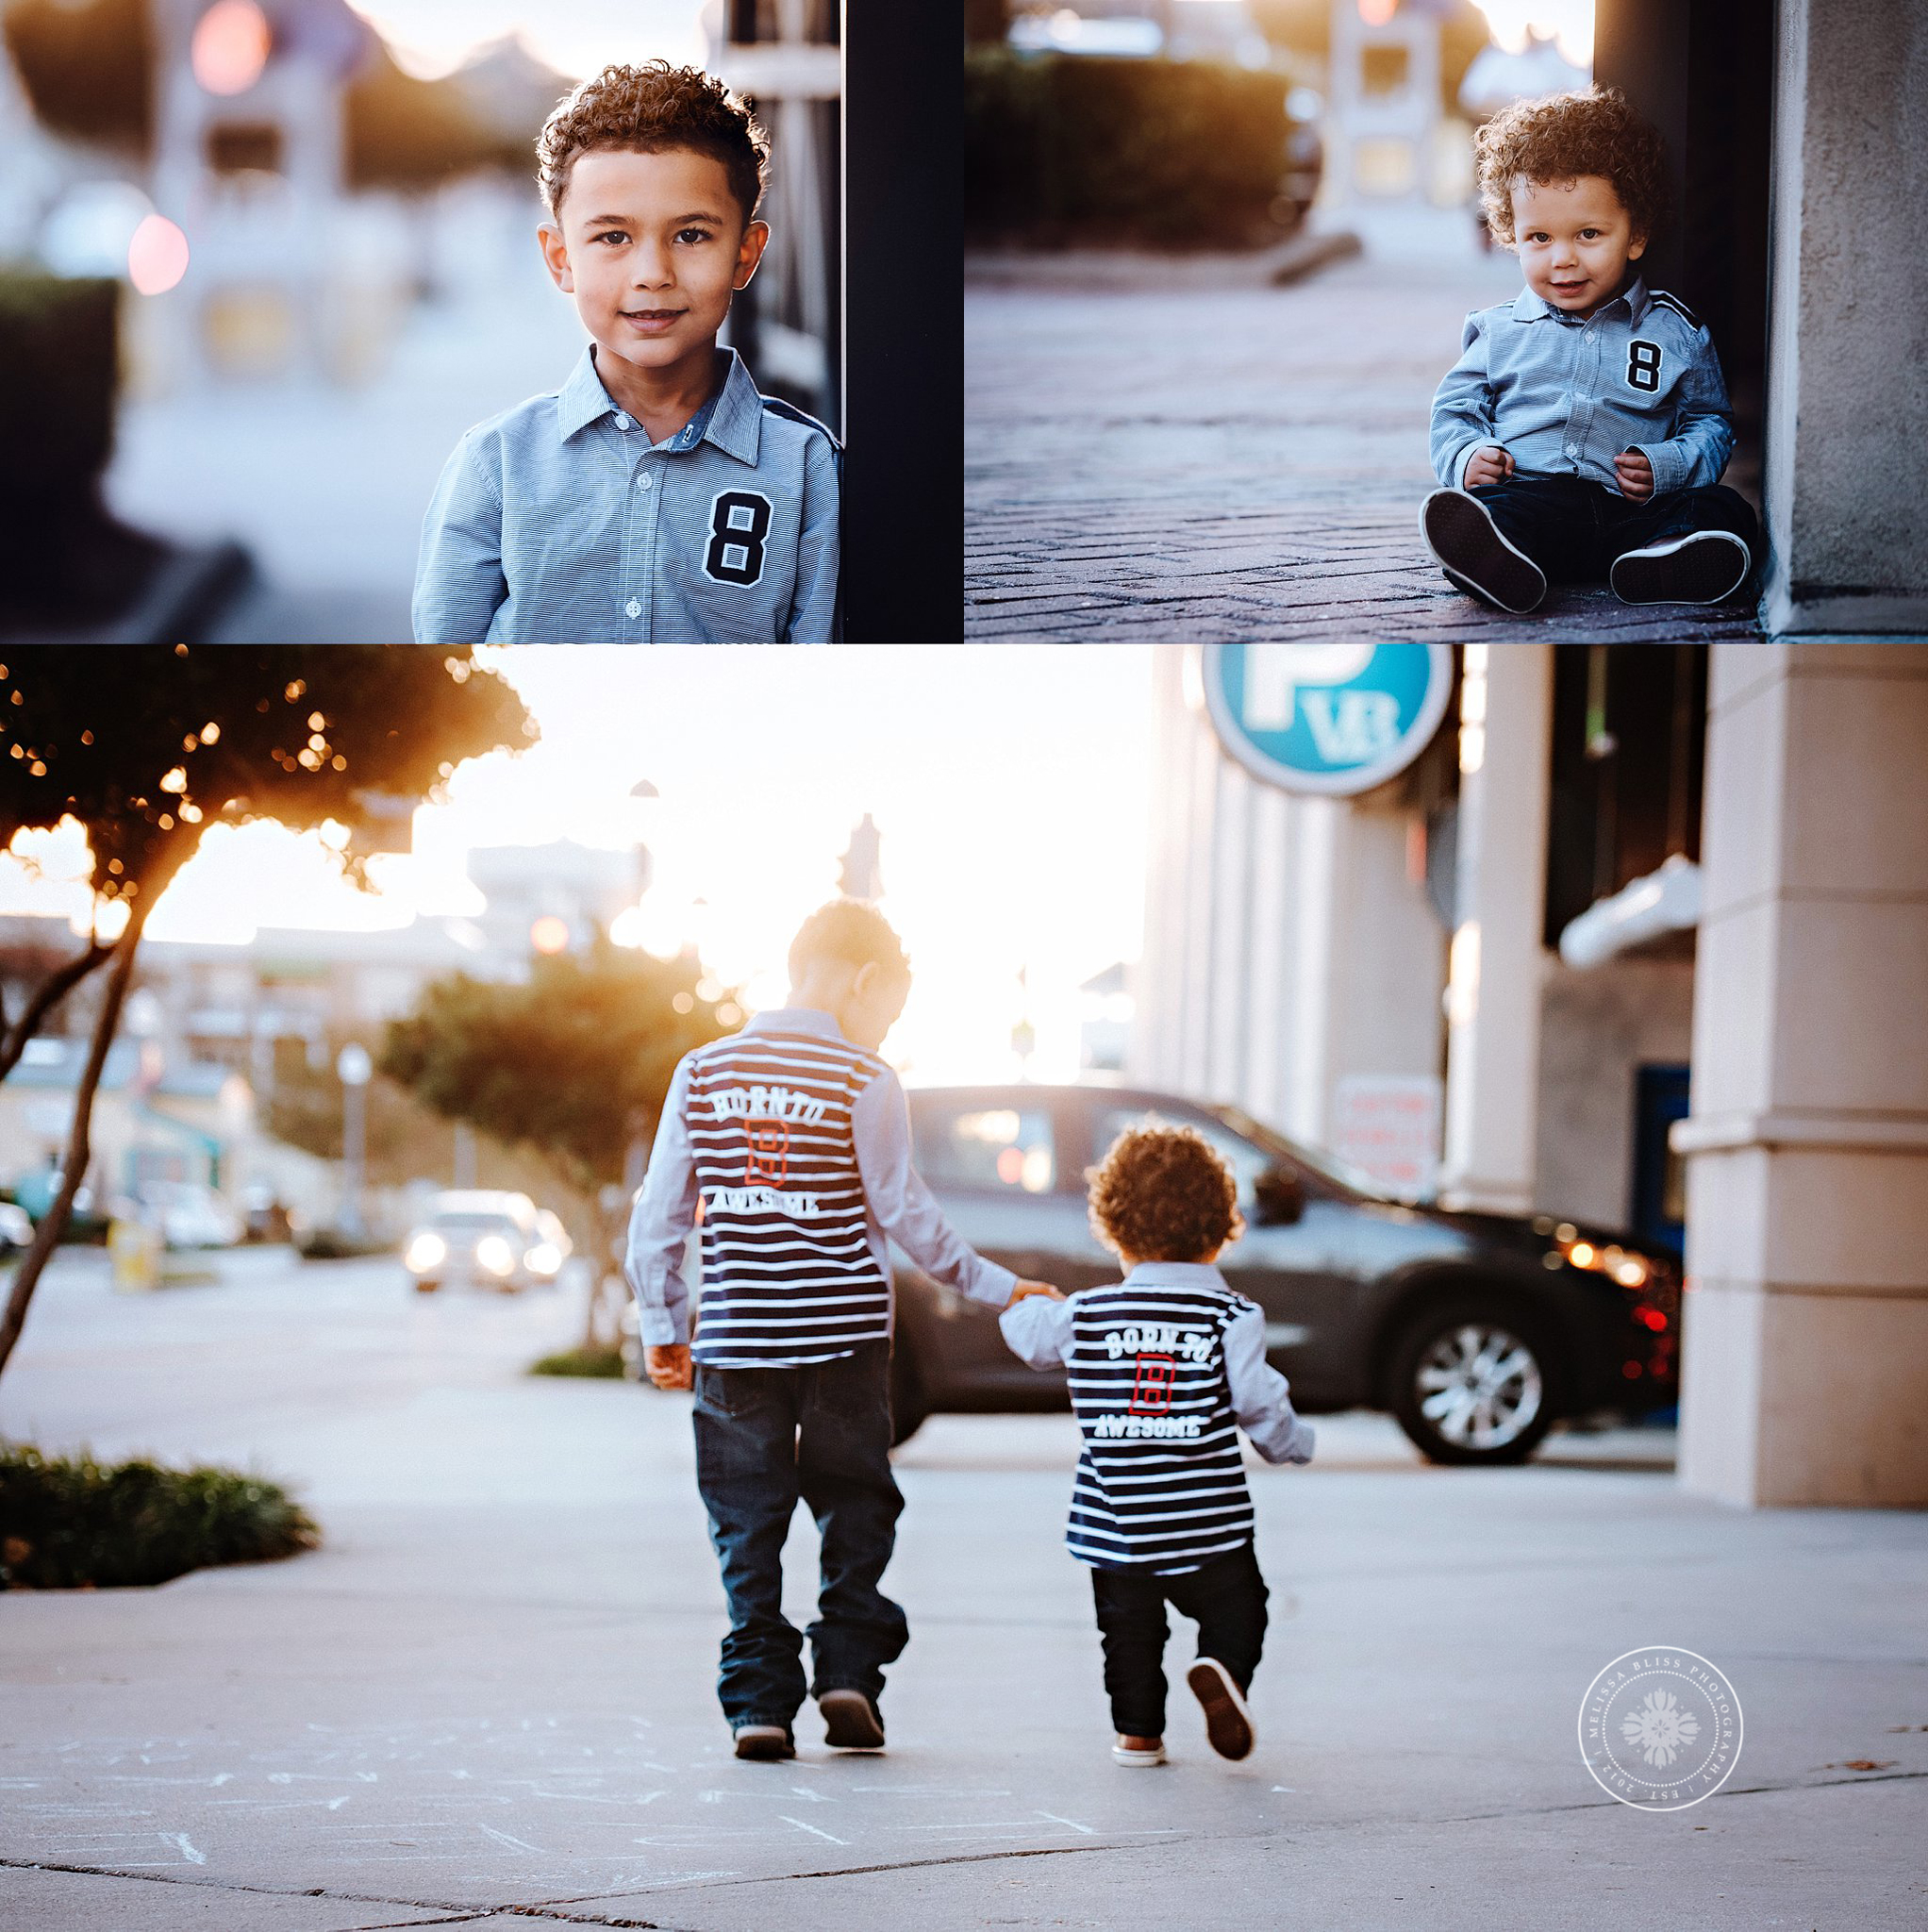 boys-walking-boardwalk-virginia-beach-va-melissa-bliss-photography